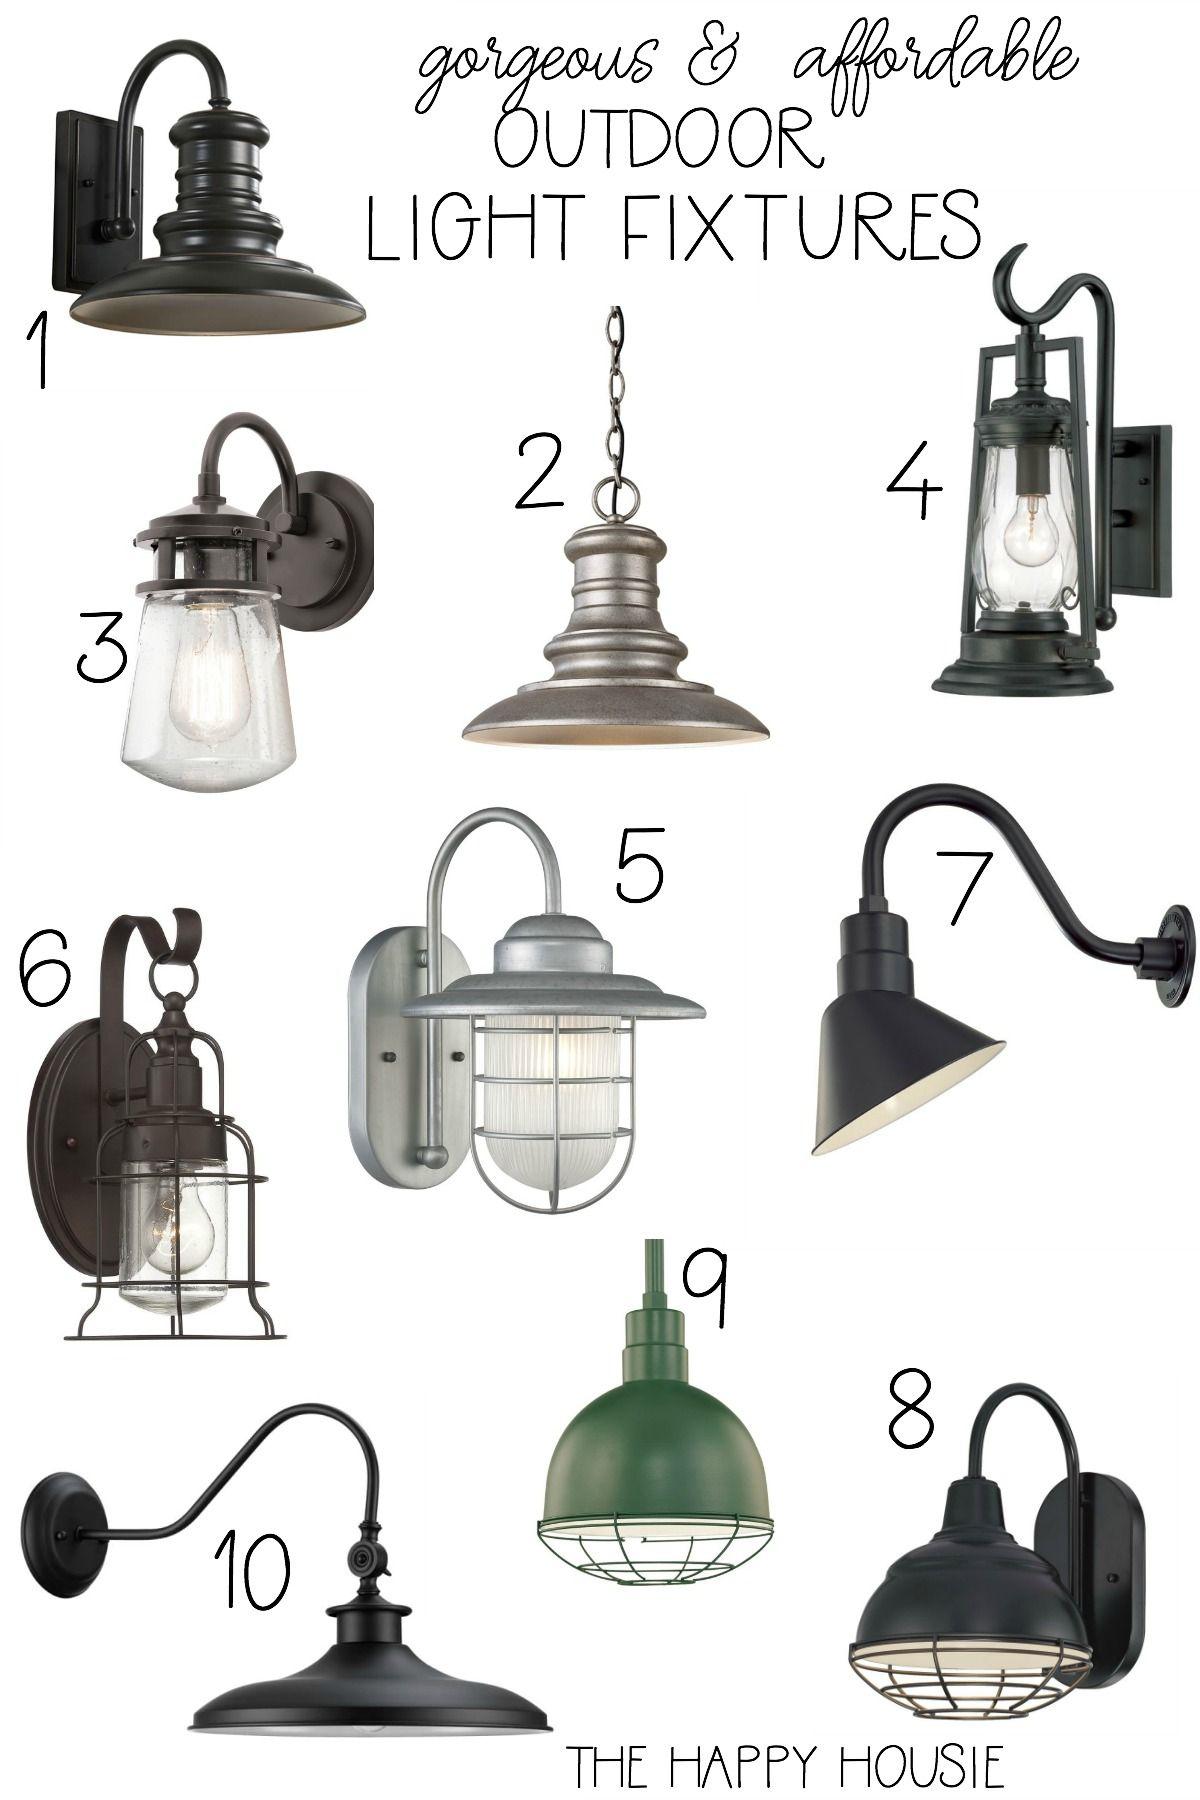 Affordable Coastal Outdoor Lighting Update images